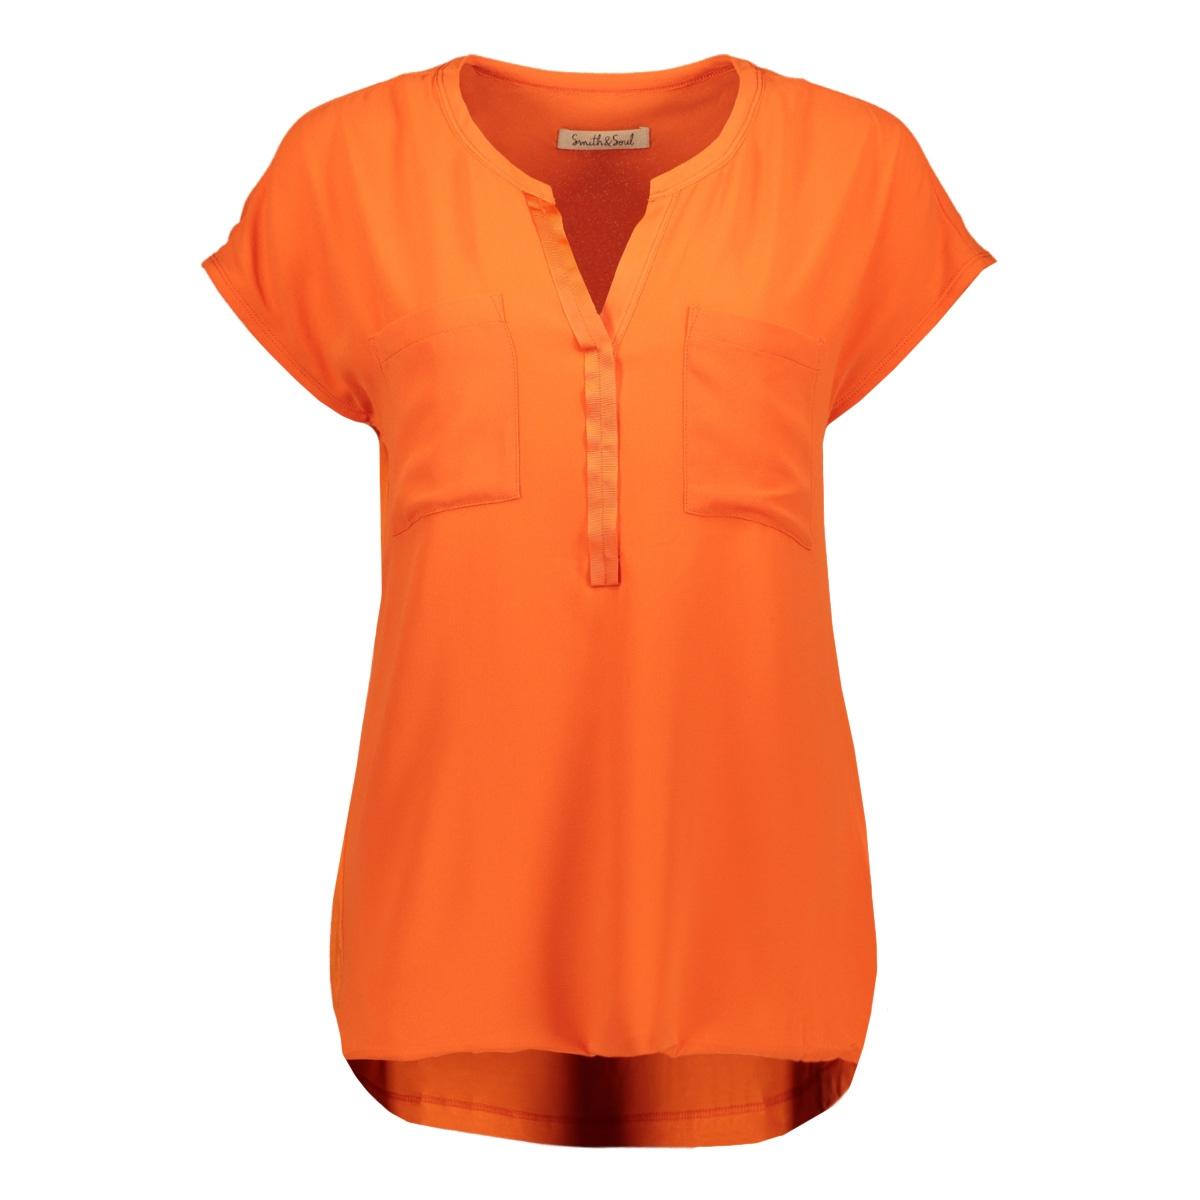 mix match blouse 1 2 0320 0348 smith & soul blouse 325 flame orange